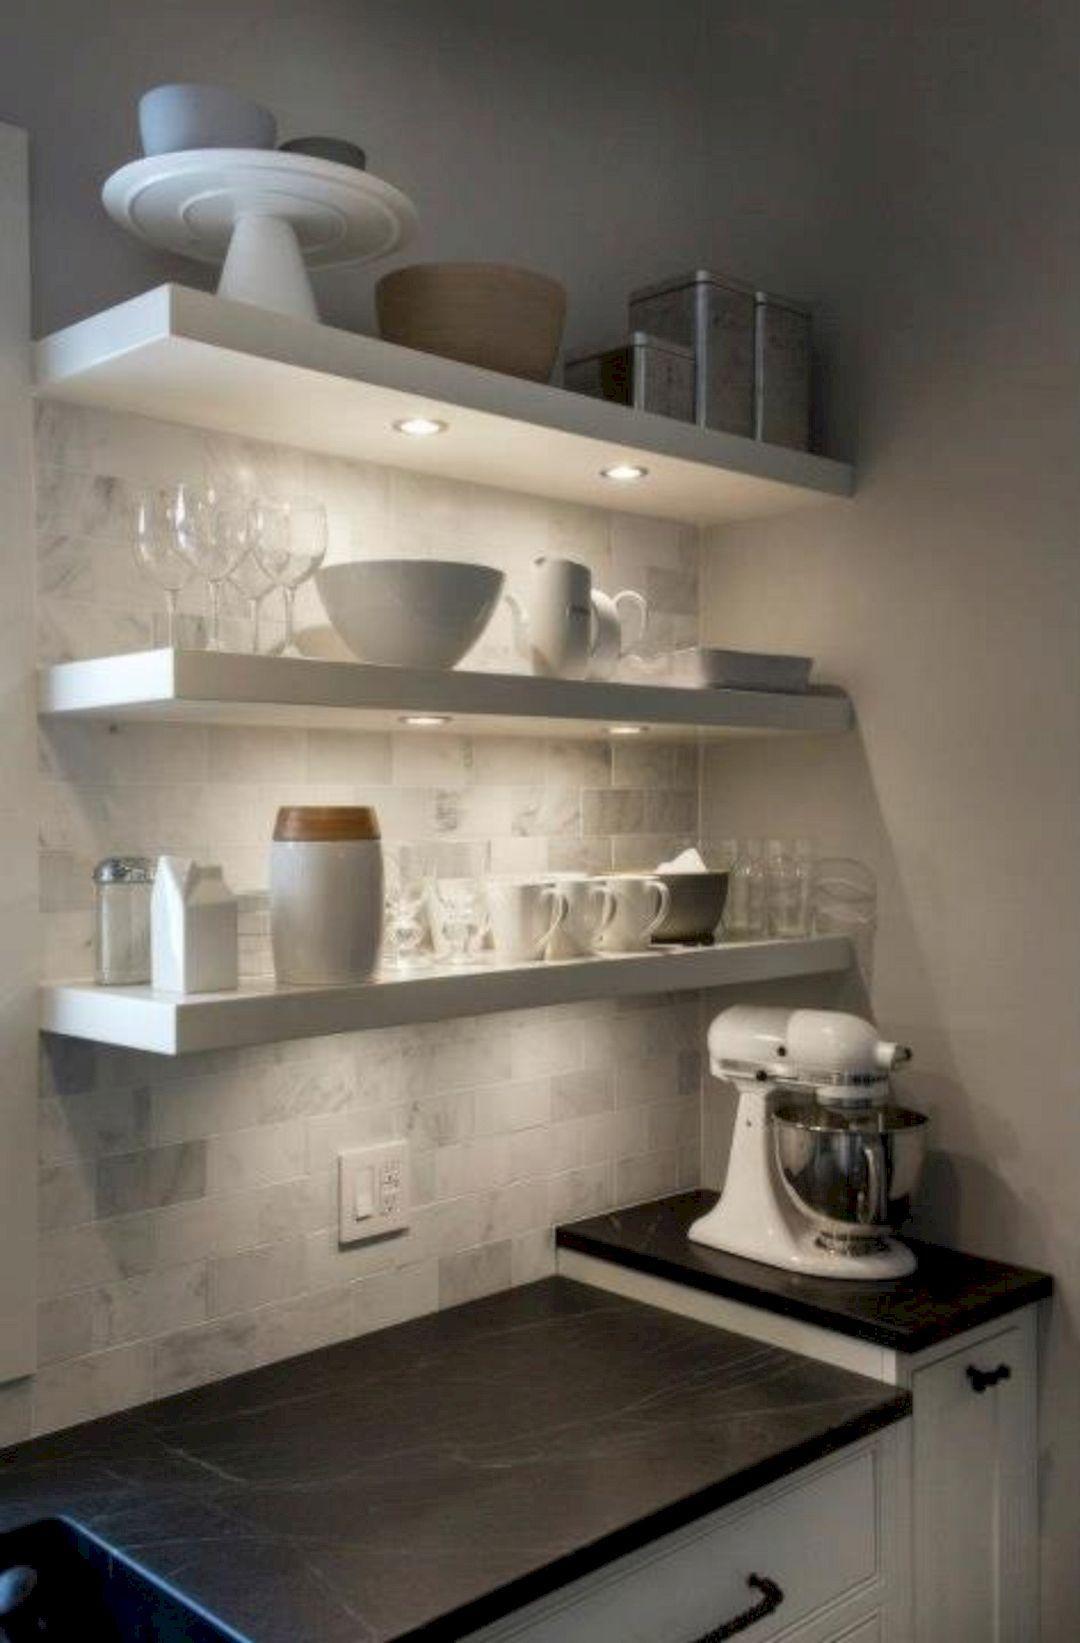 15 Awesome Staircase Lighting Ideas Ikea Lack Shelves Floating Shelves Kitchen Shelves